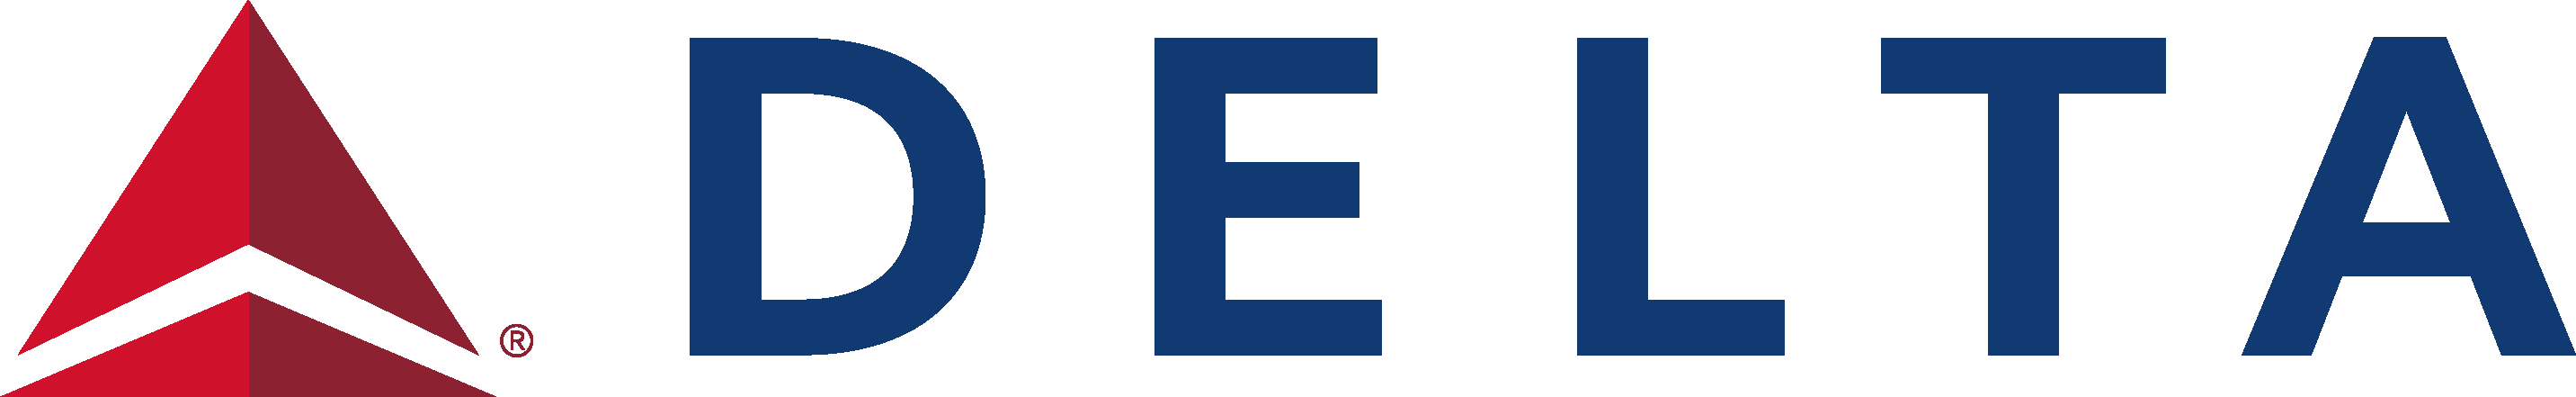 Delta Airlines Logo Download Vector.